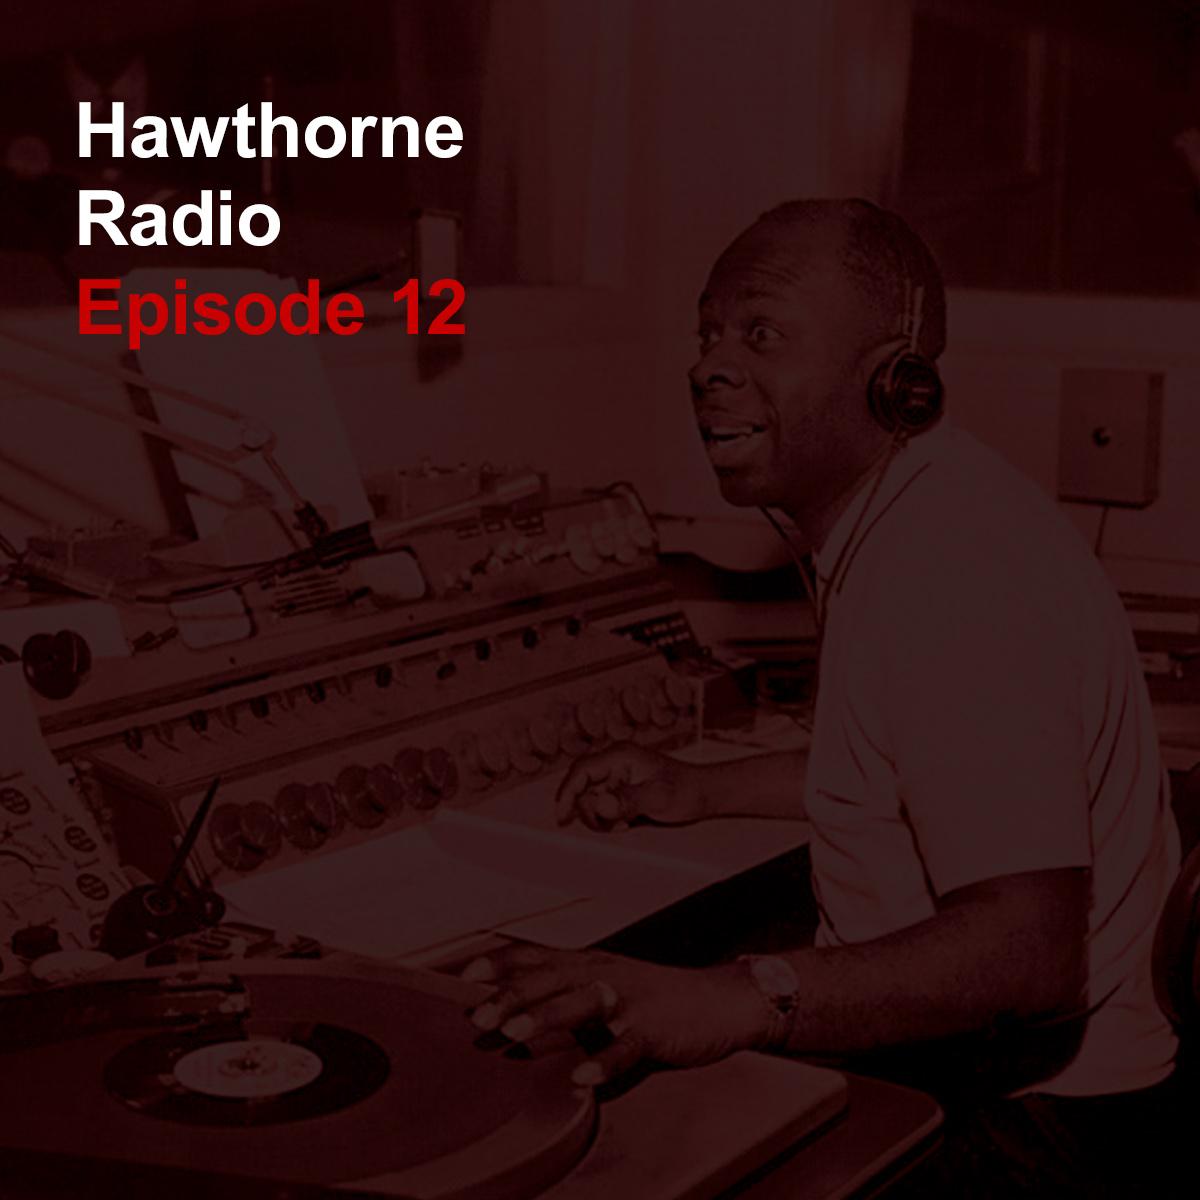 Hawthorne Radio Episode 12 - Mayer Hawthorne | Official Site